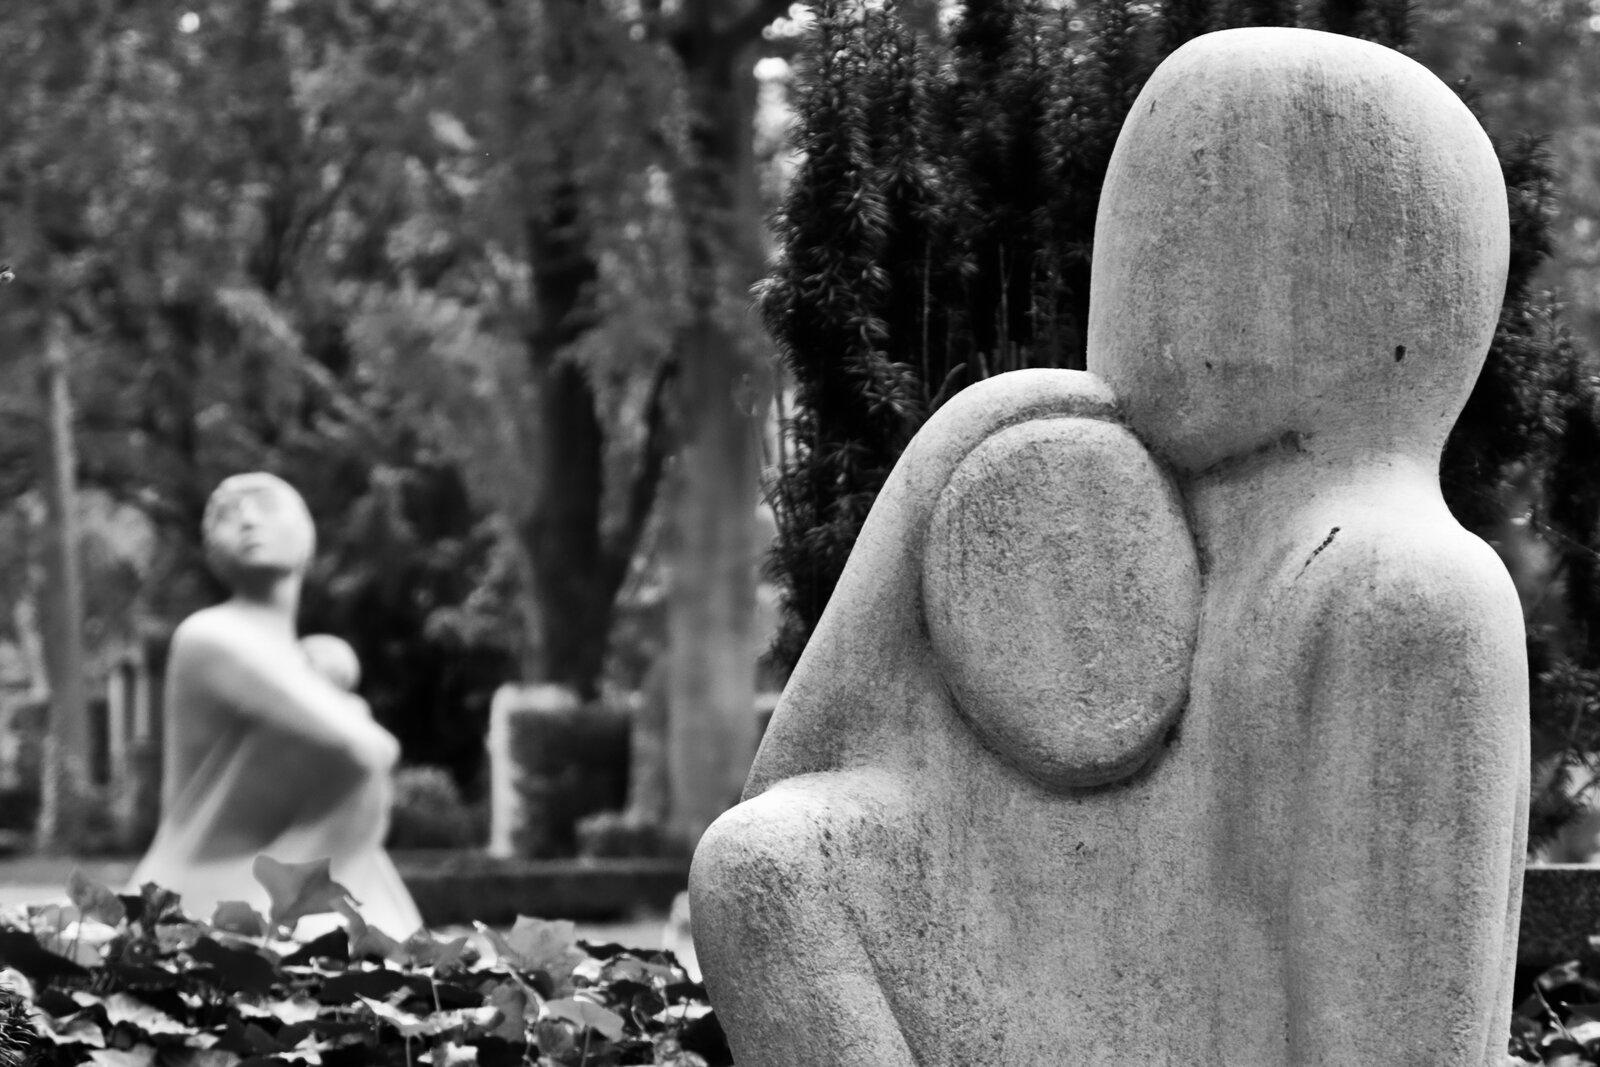 12_DSCF0440_2014_04Friedhof-Karlsruhe-Edit____Friedhof-KA.jpg